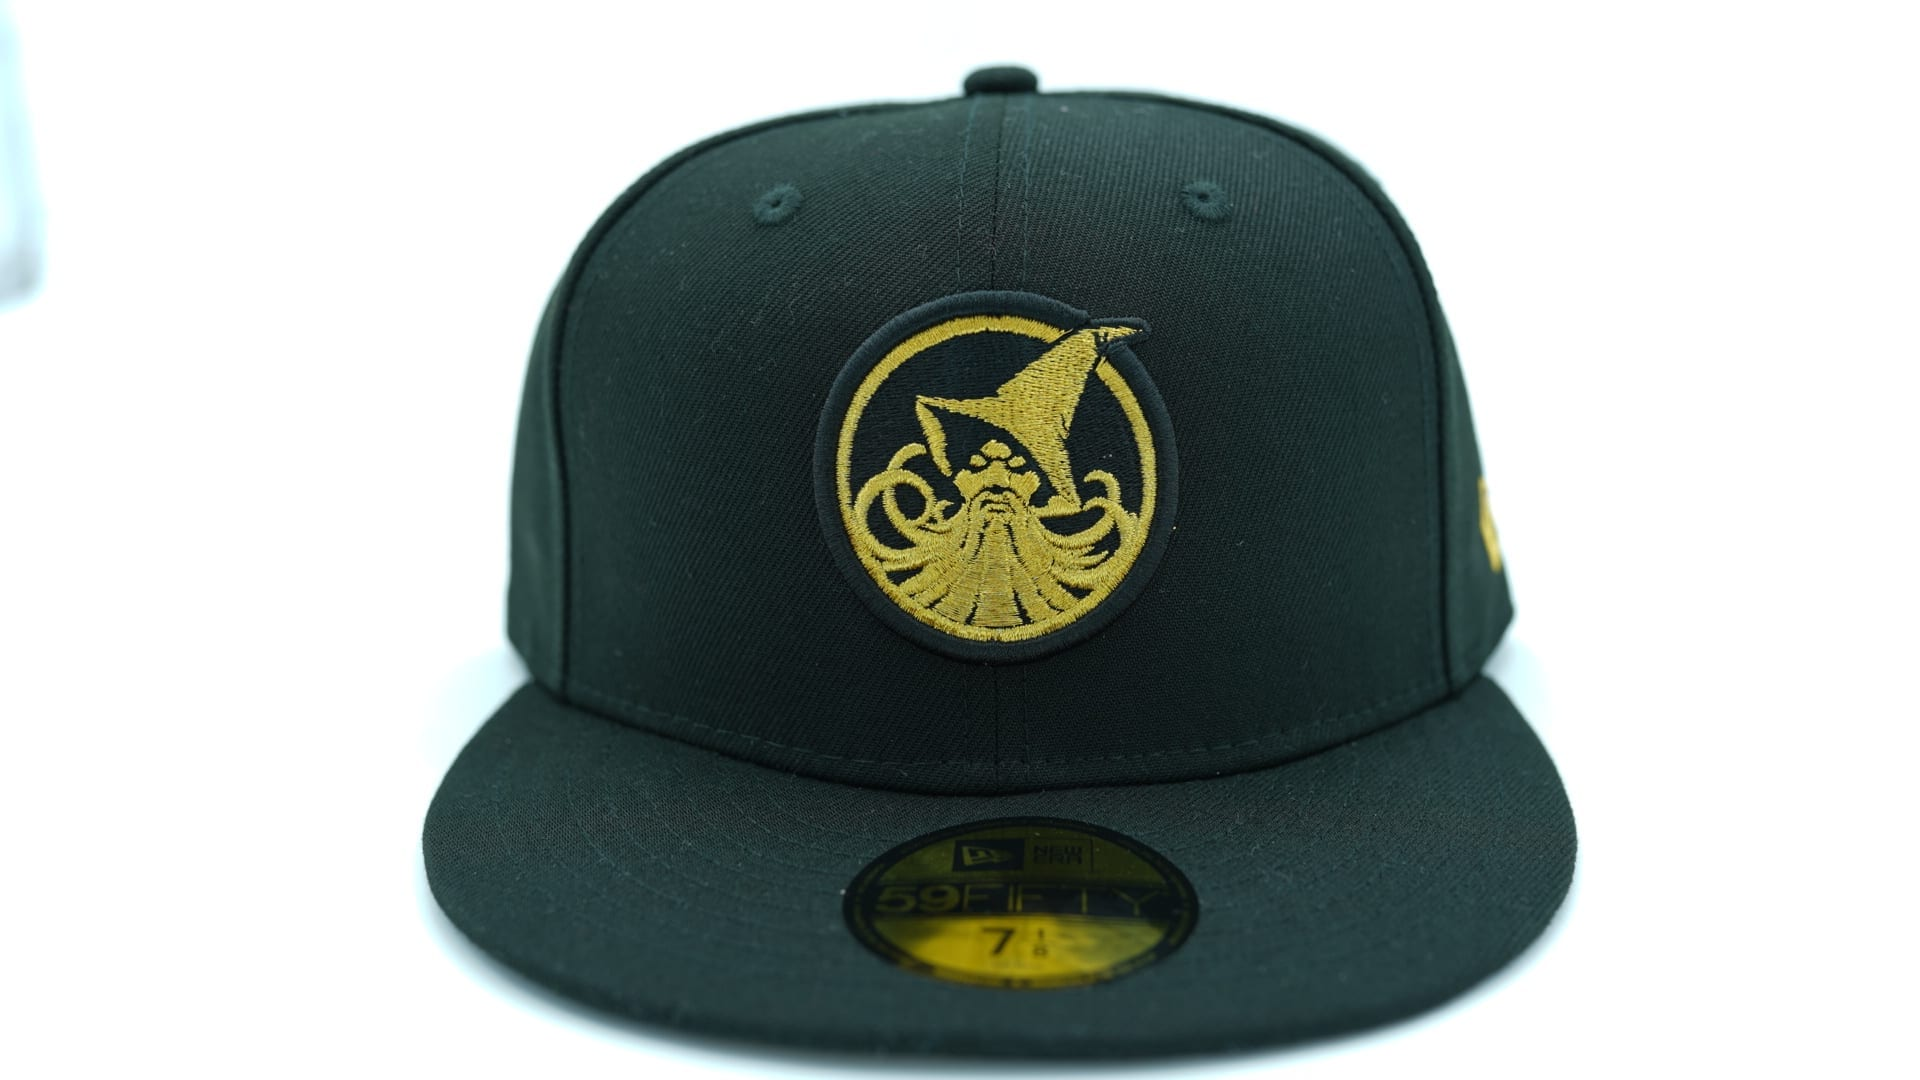 Boston Celtics Team Nation Fitted Baseball Cap by ADIDAS x NBA ... 12793a469f3